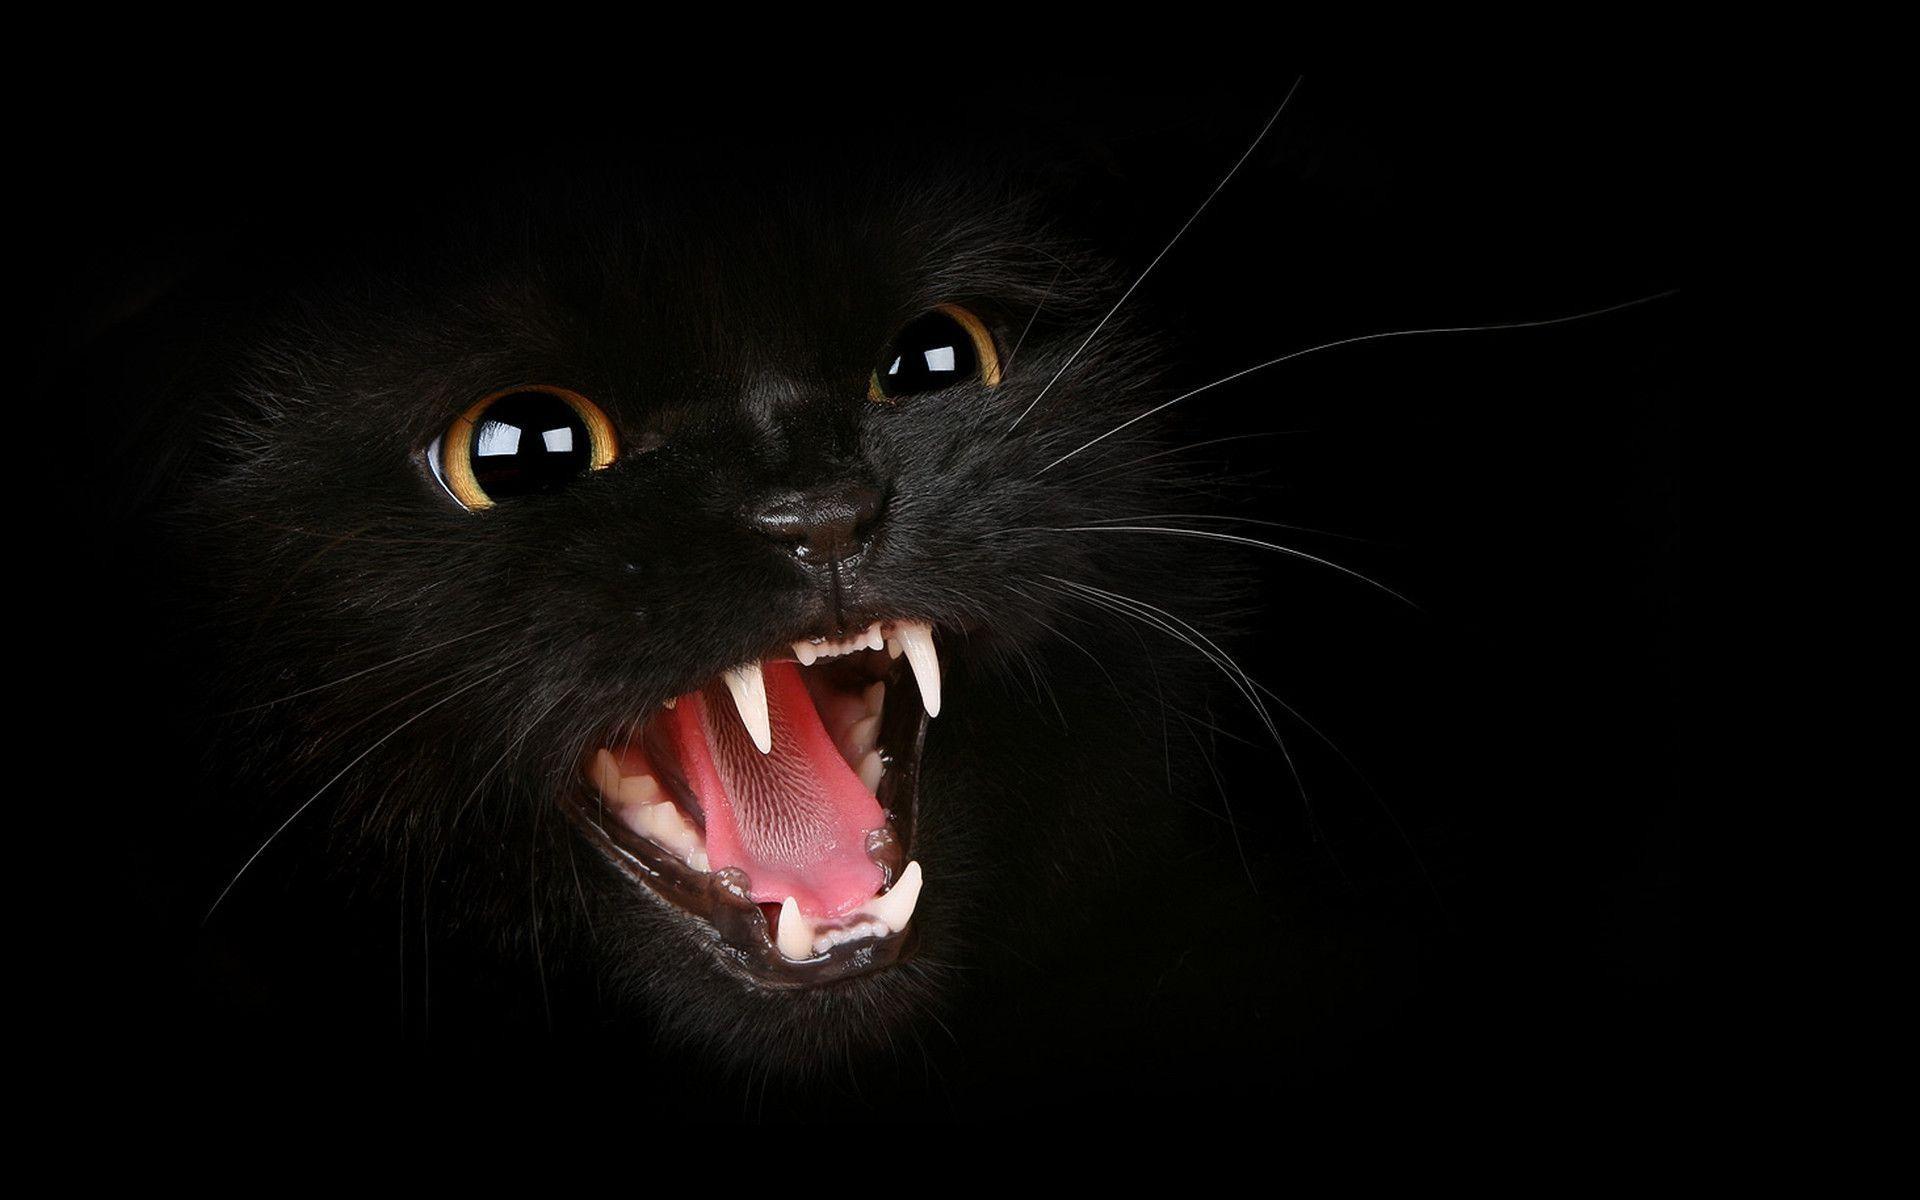 Black Cat HD Wallpapers   Black Cat Images   Cool Wallpapers